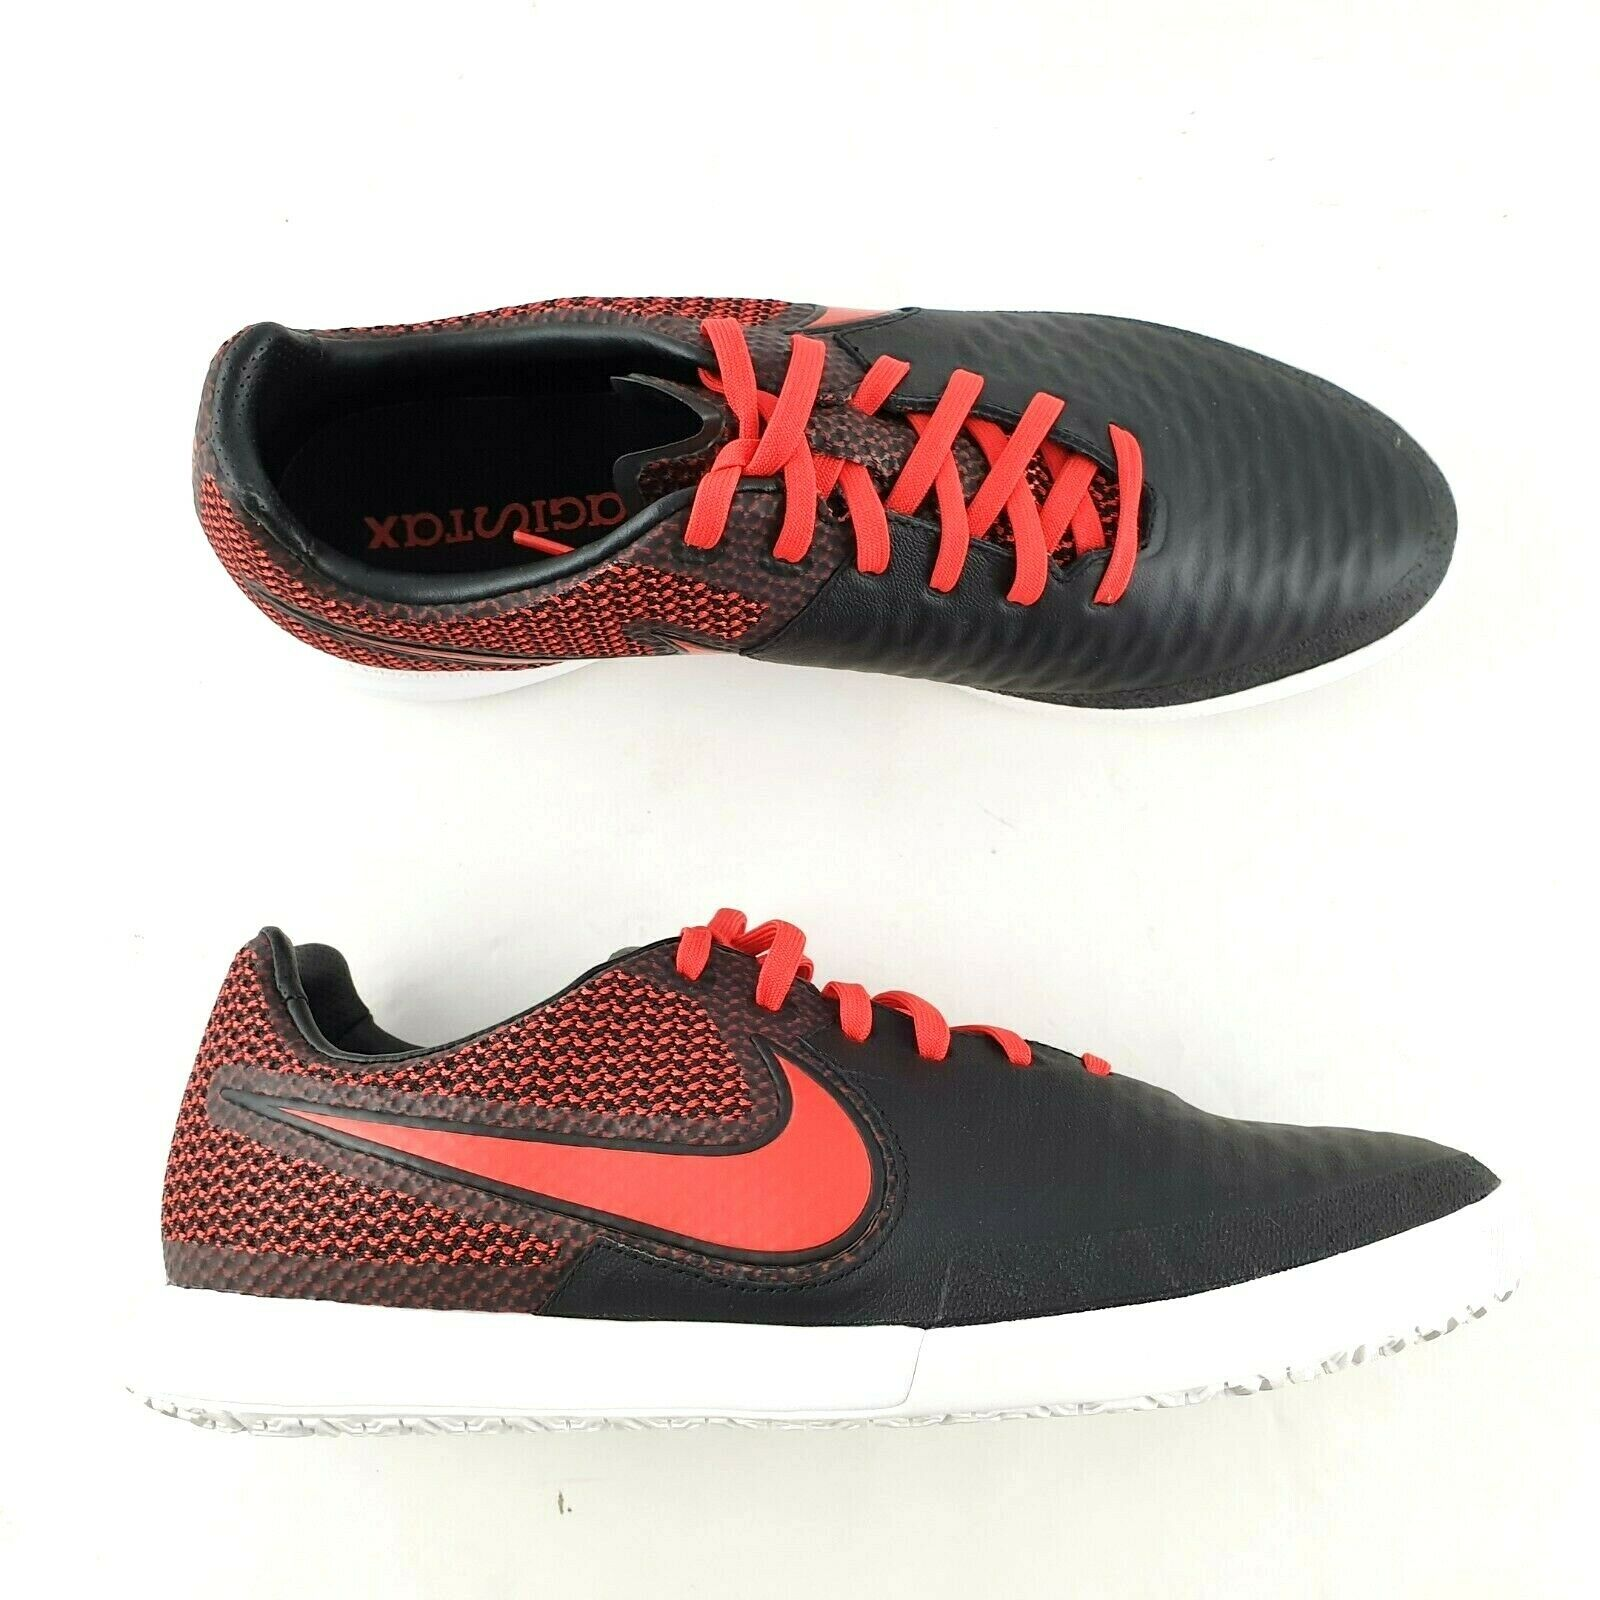 Desgastado fondo Día  Nike MAGISTAX Finale II IC Mens Indoor Competition Football BOOTS 844444  777 for sale online | eBay